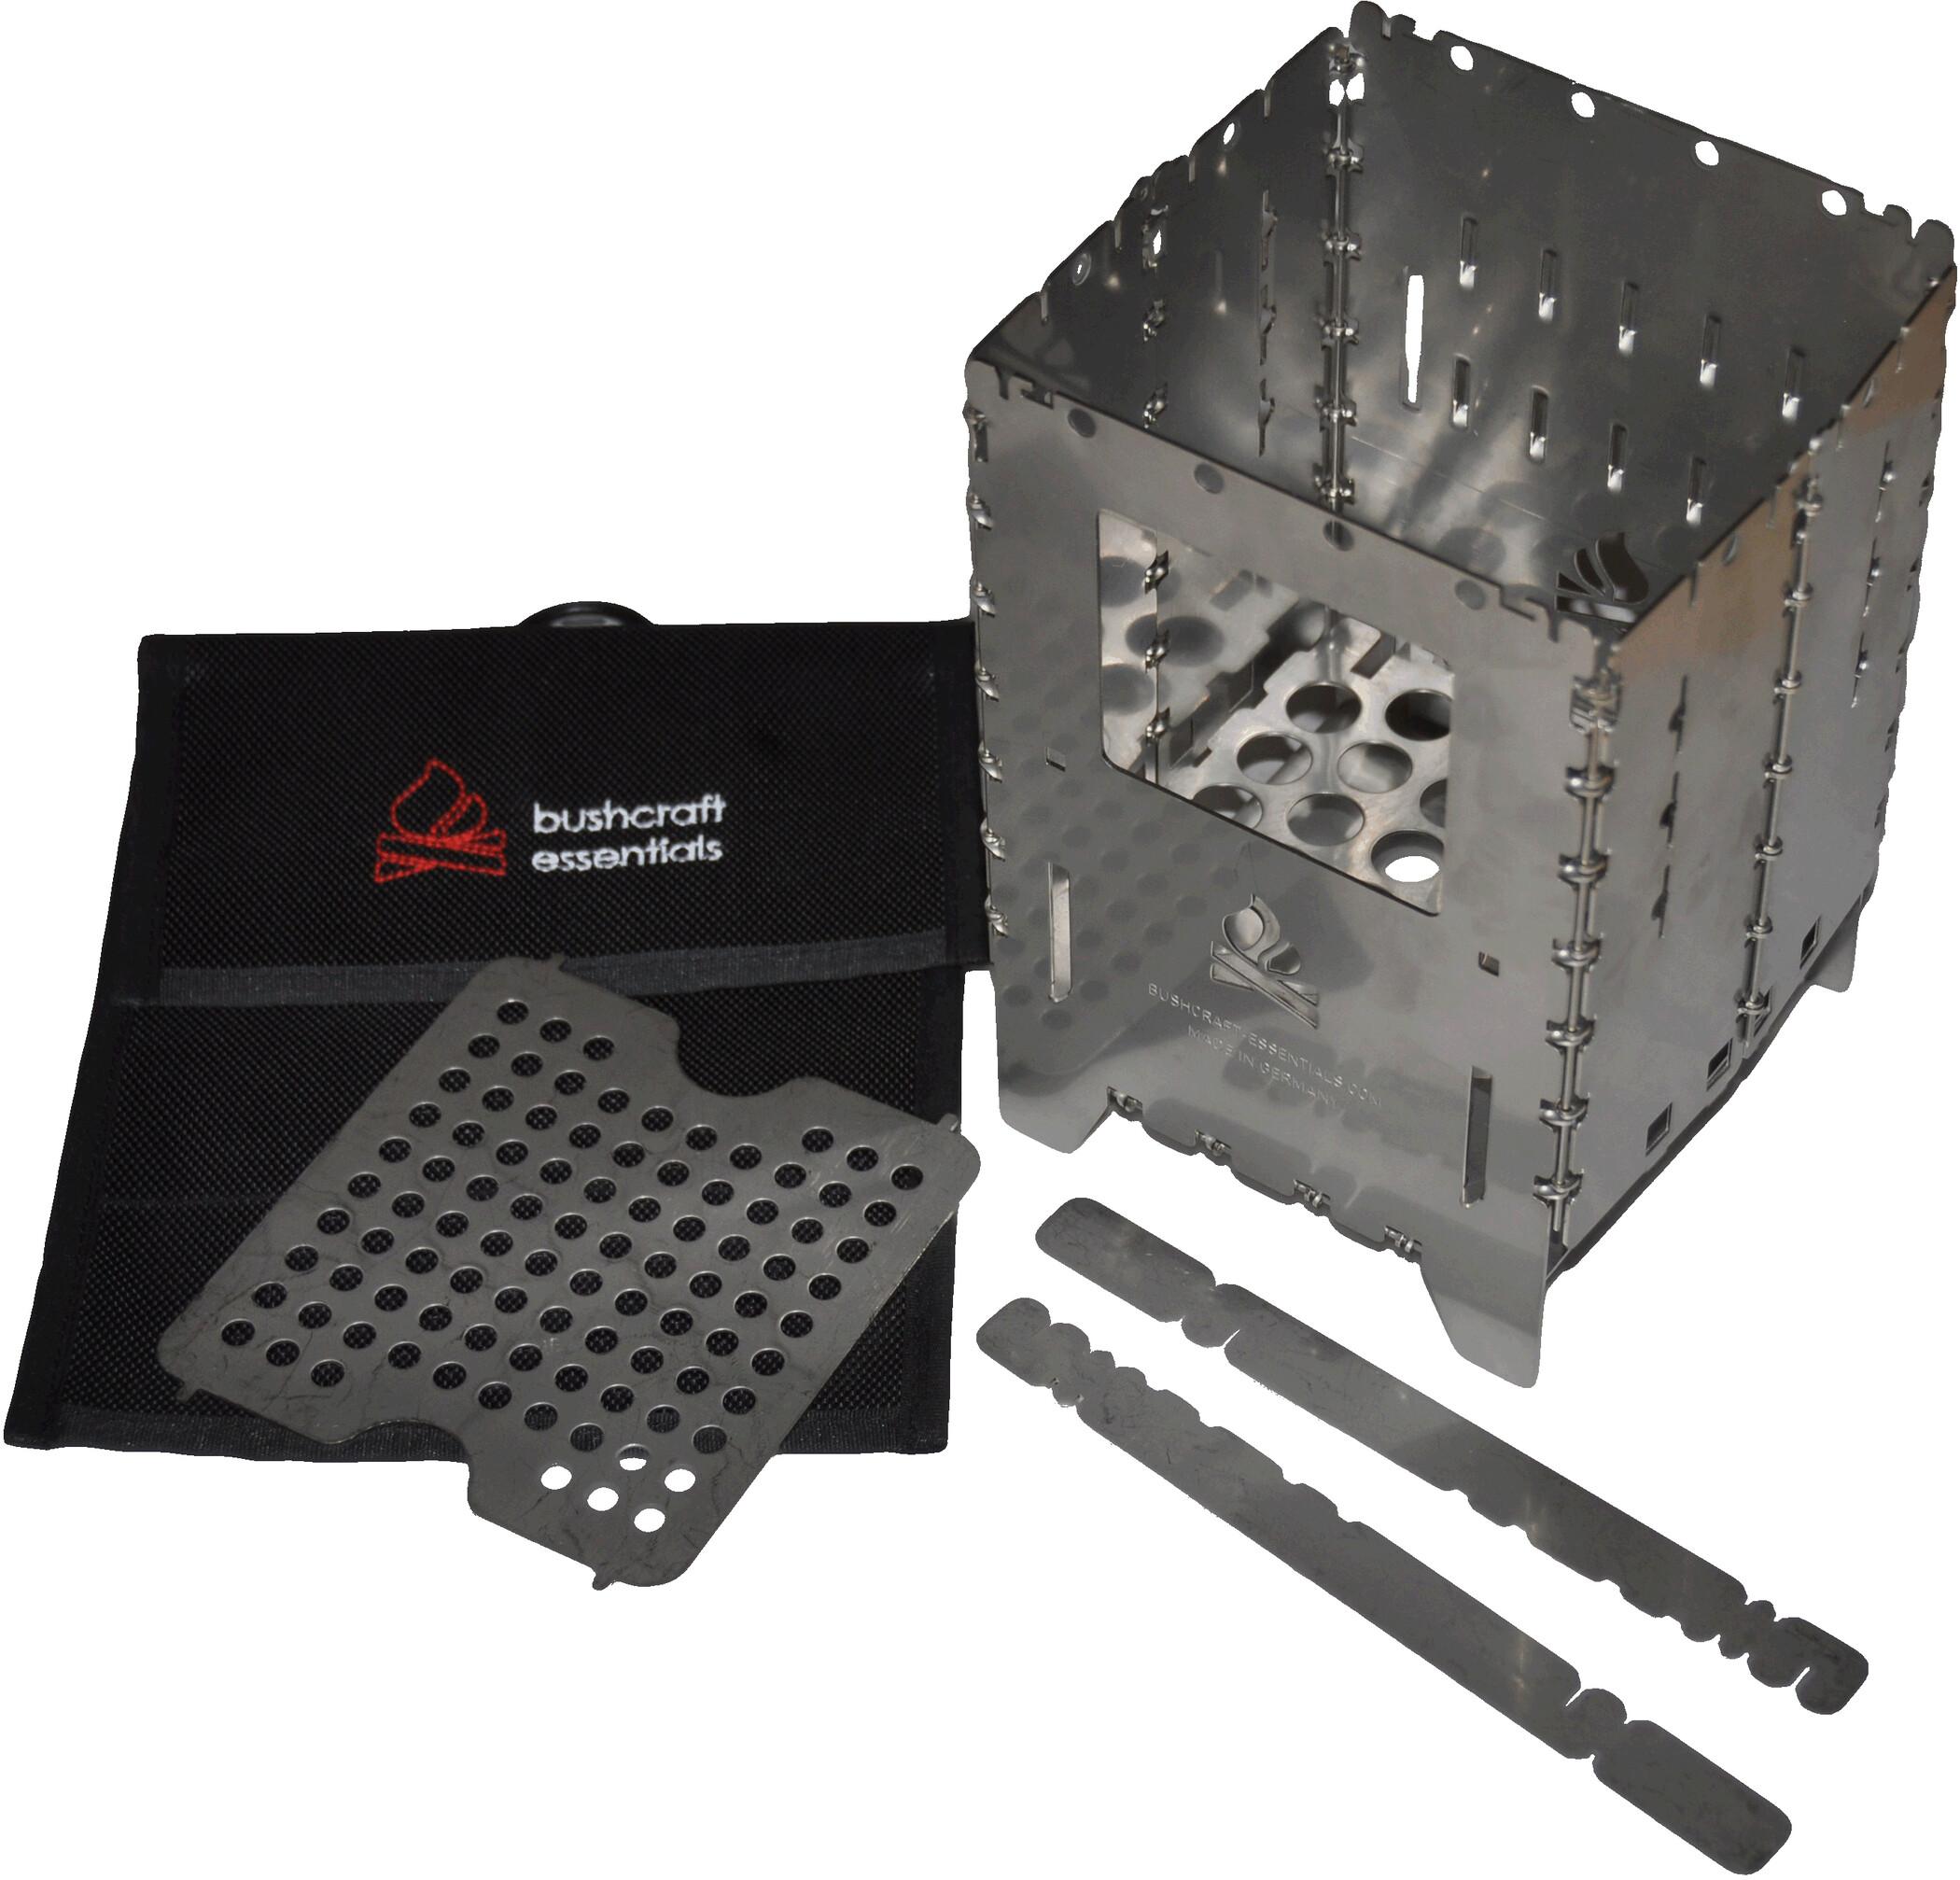 Bushcraft Essentials Bushbox XL Profi Set | Travel bags